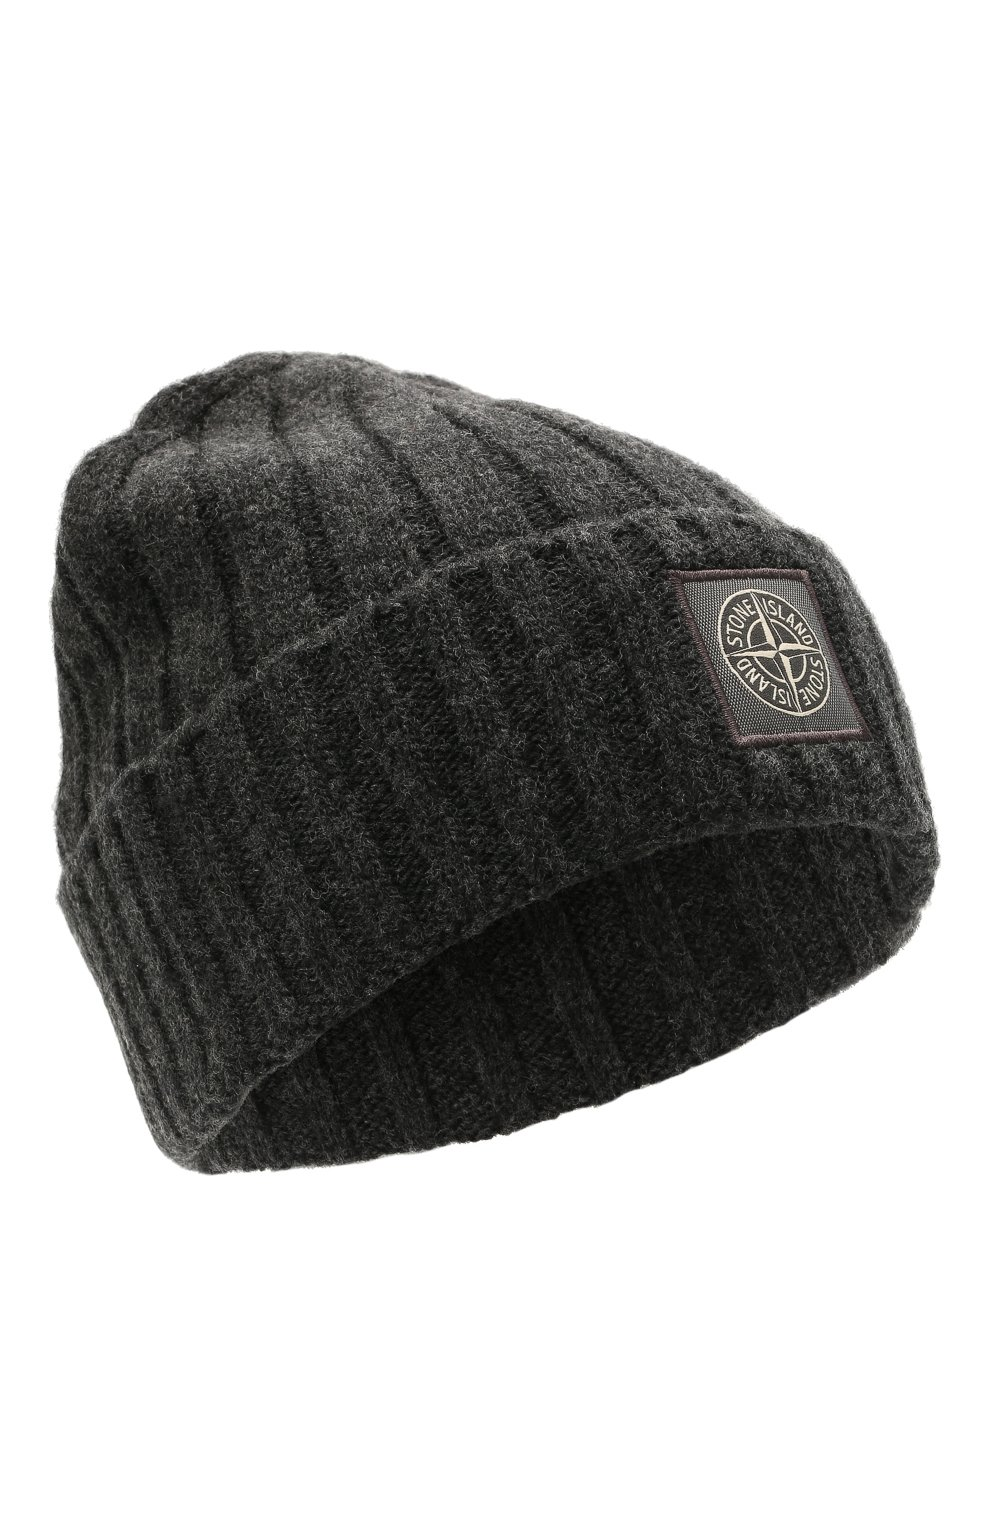 Мужская шерстяная шапка STONE ISLAND темно-серого цвета, арт. 7515N24B5 | Фото 1 (Материал: Шерсть; Кросс-КТ: Трикотаж)